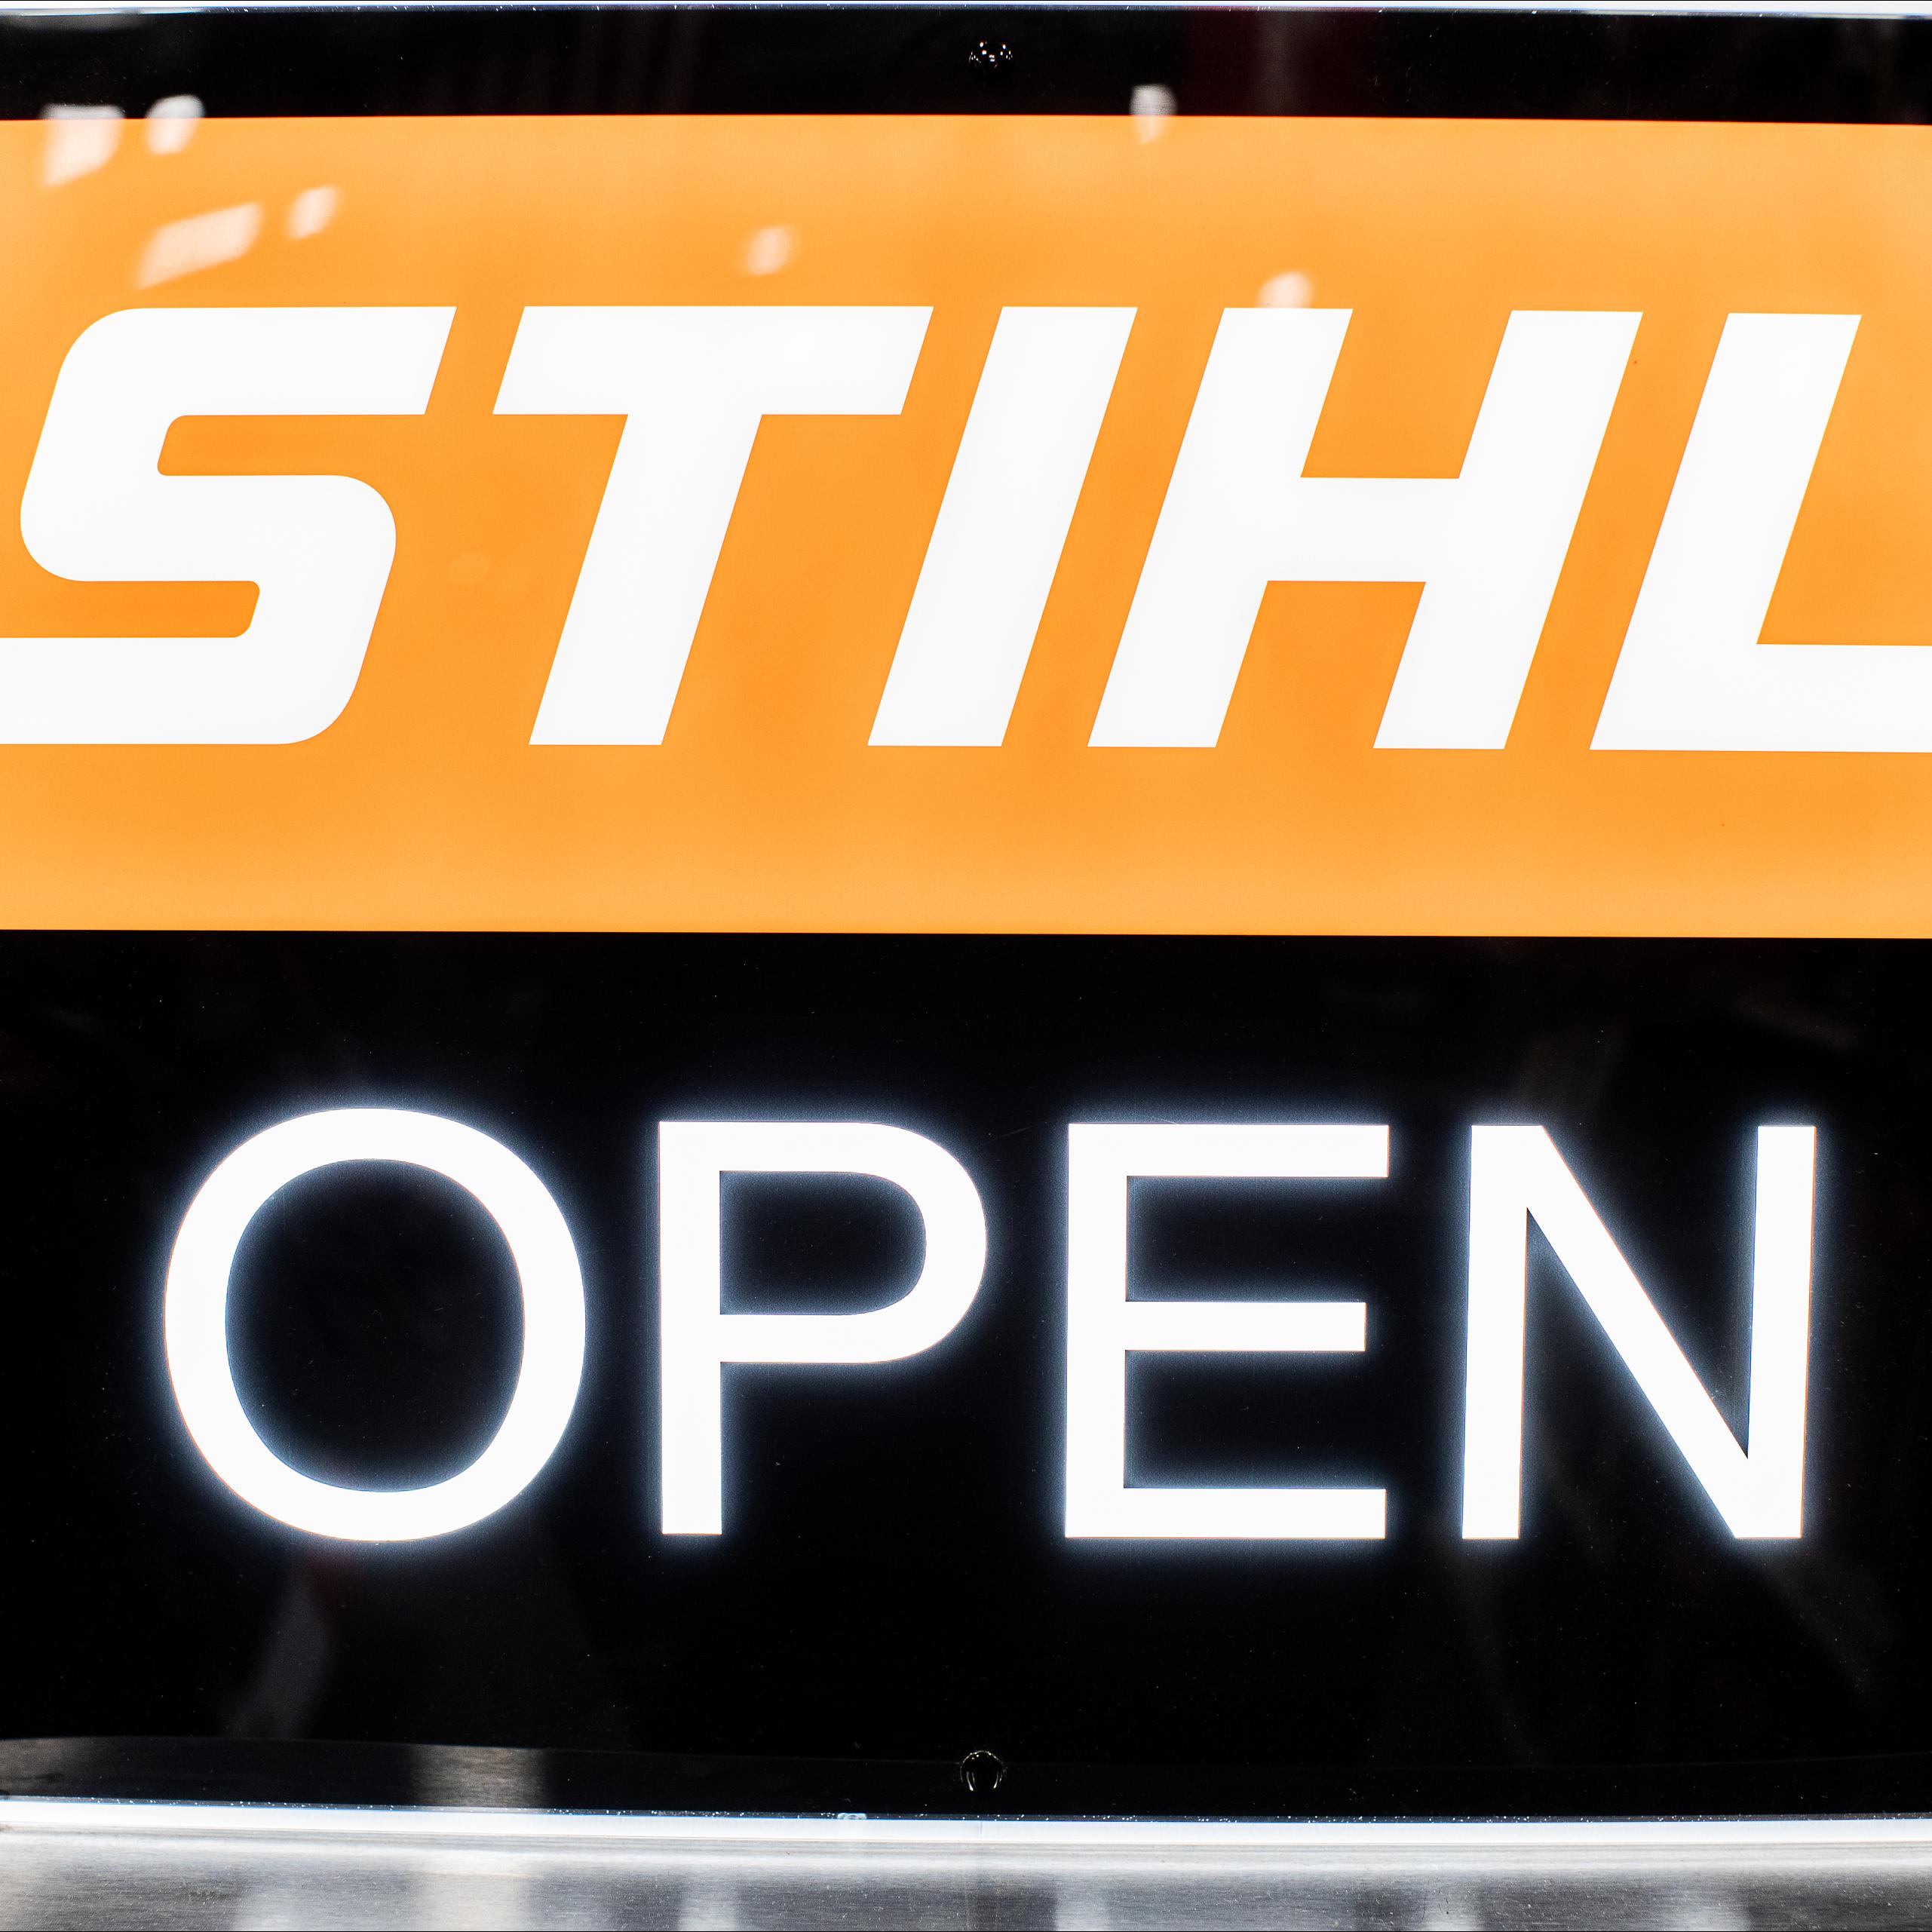 Stihl open sign